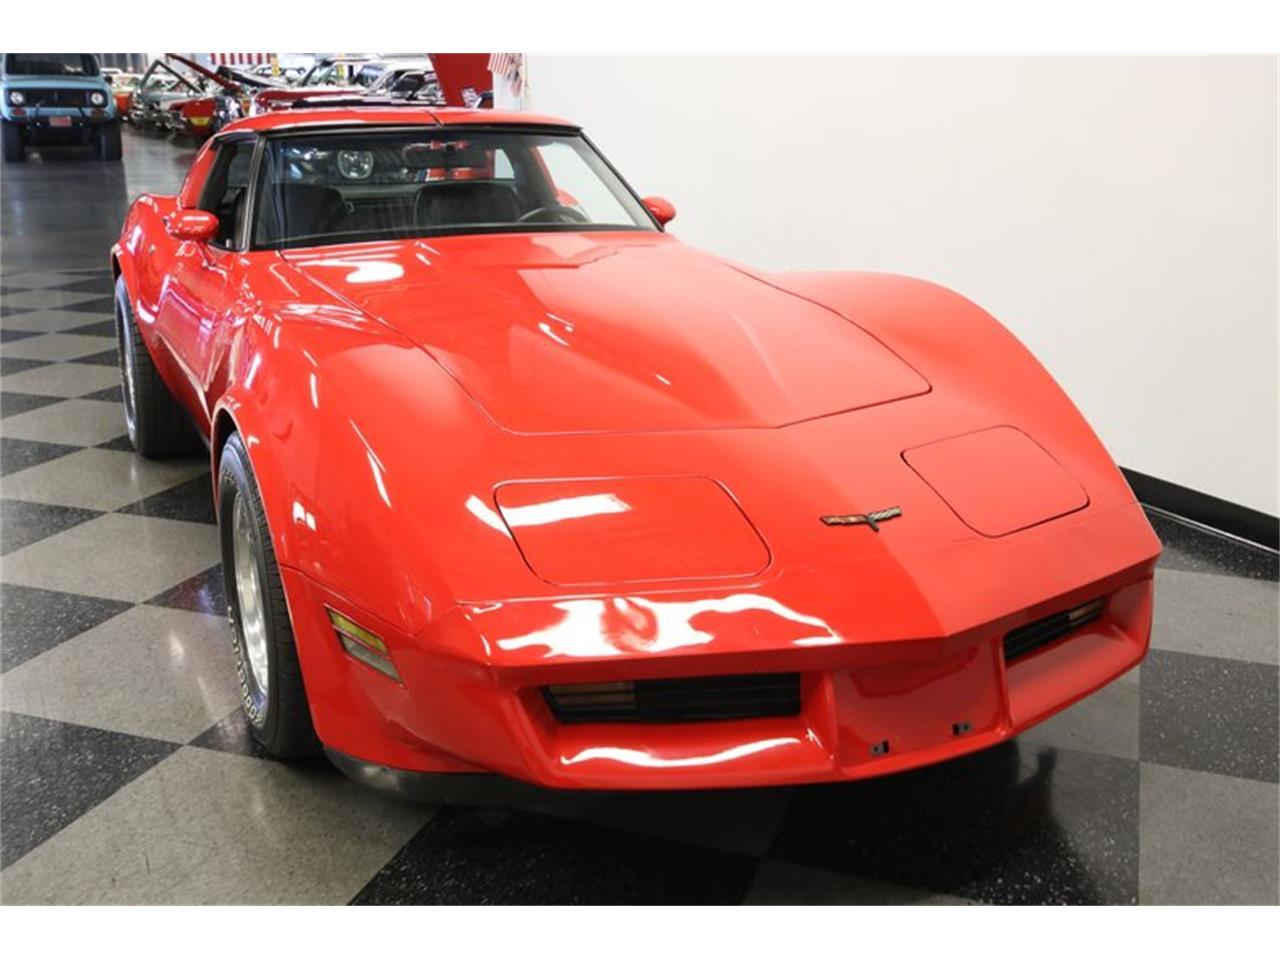 1981 Chevrolet Corvette (CC-1412998) for sale in Lutz, Florida